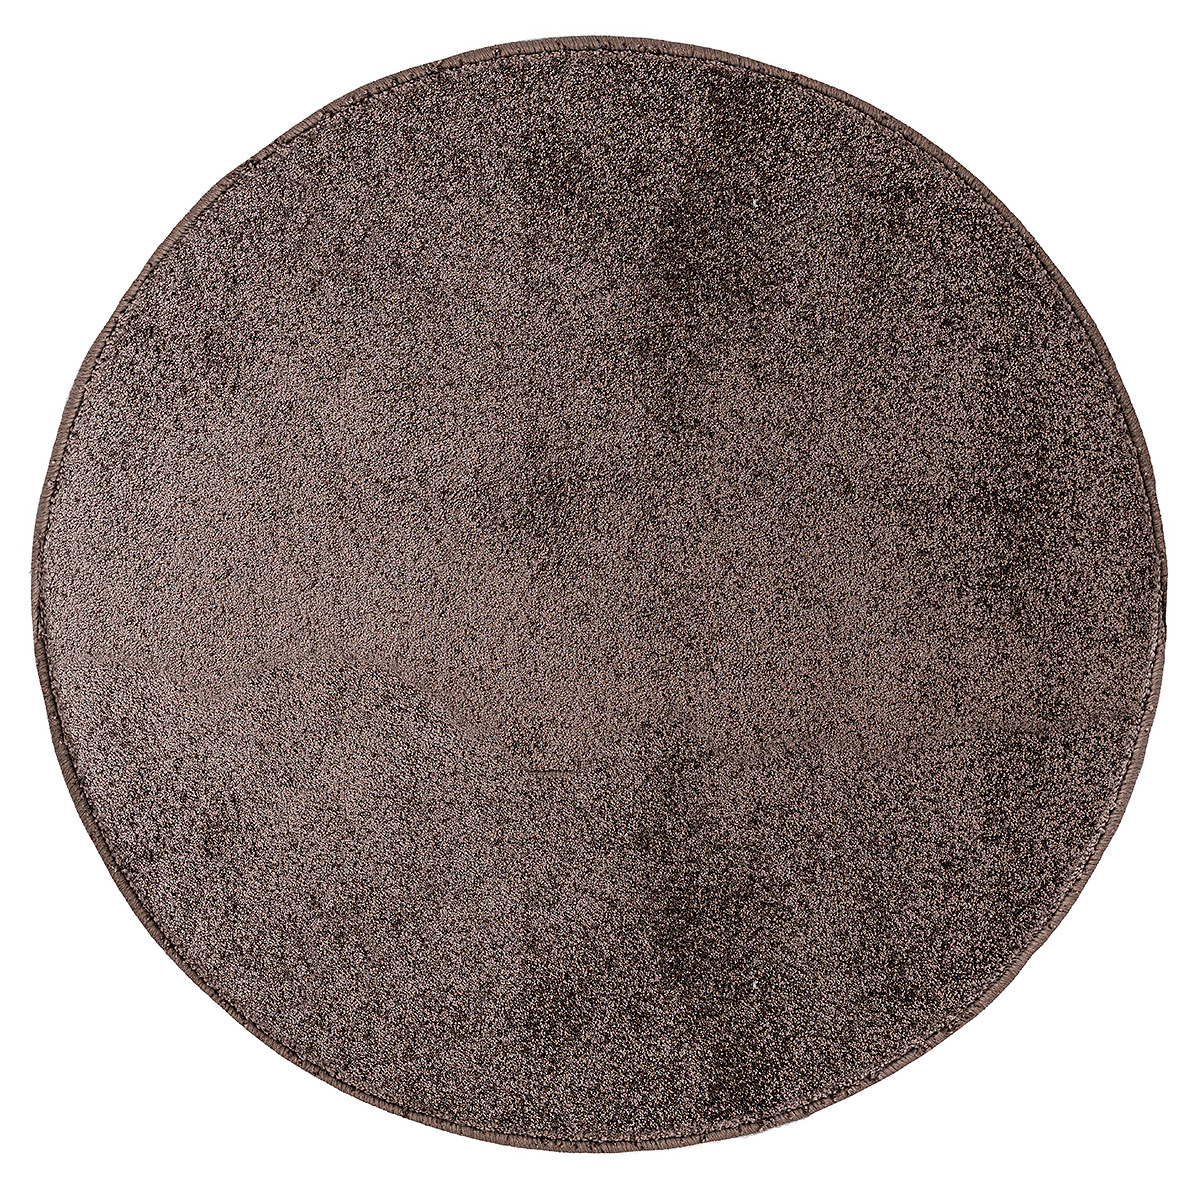 Vopi Kusový koberec Capri hnedá, 120 cm